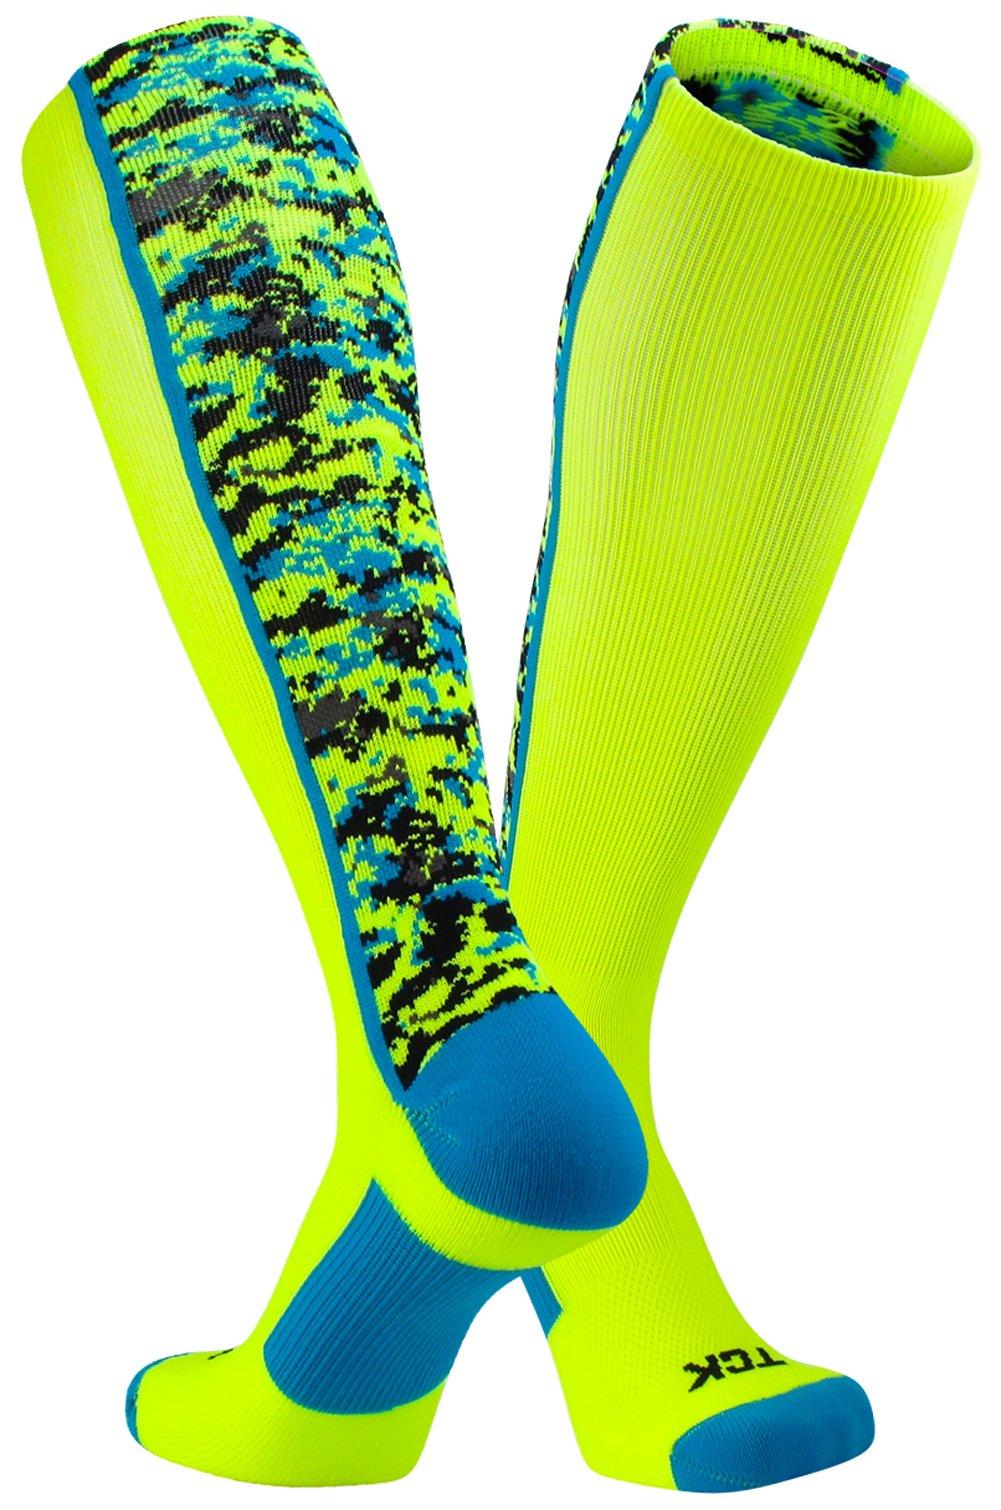 TCK Sports Digital Camo Over The Calf Socks (Neon Yellow/Electric Blue, Medium)